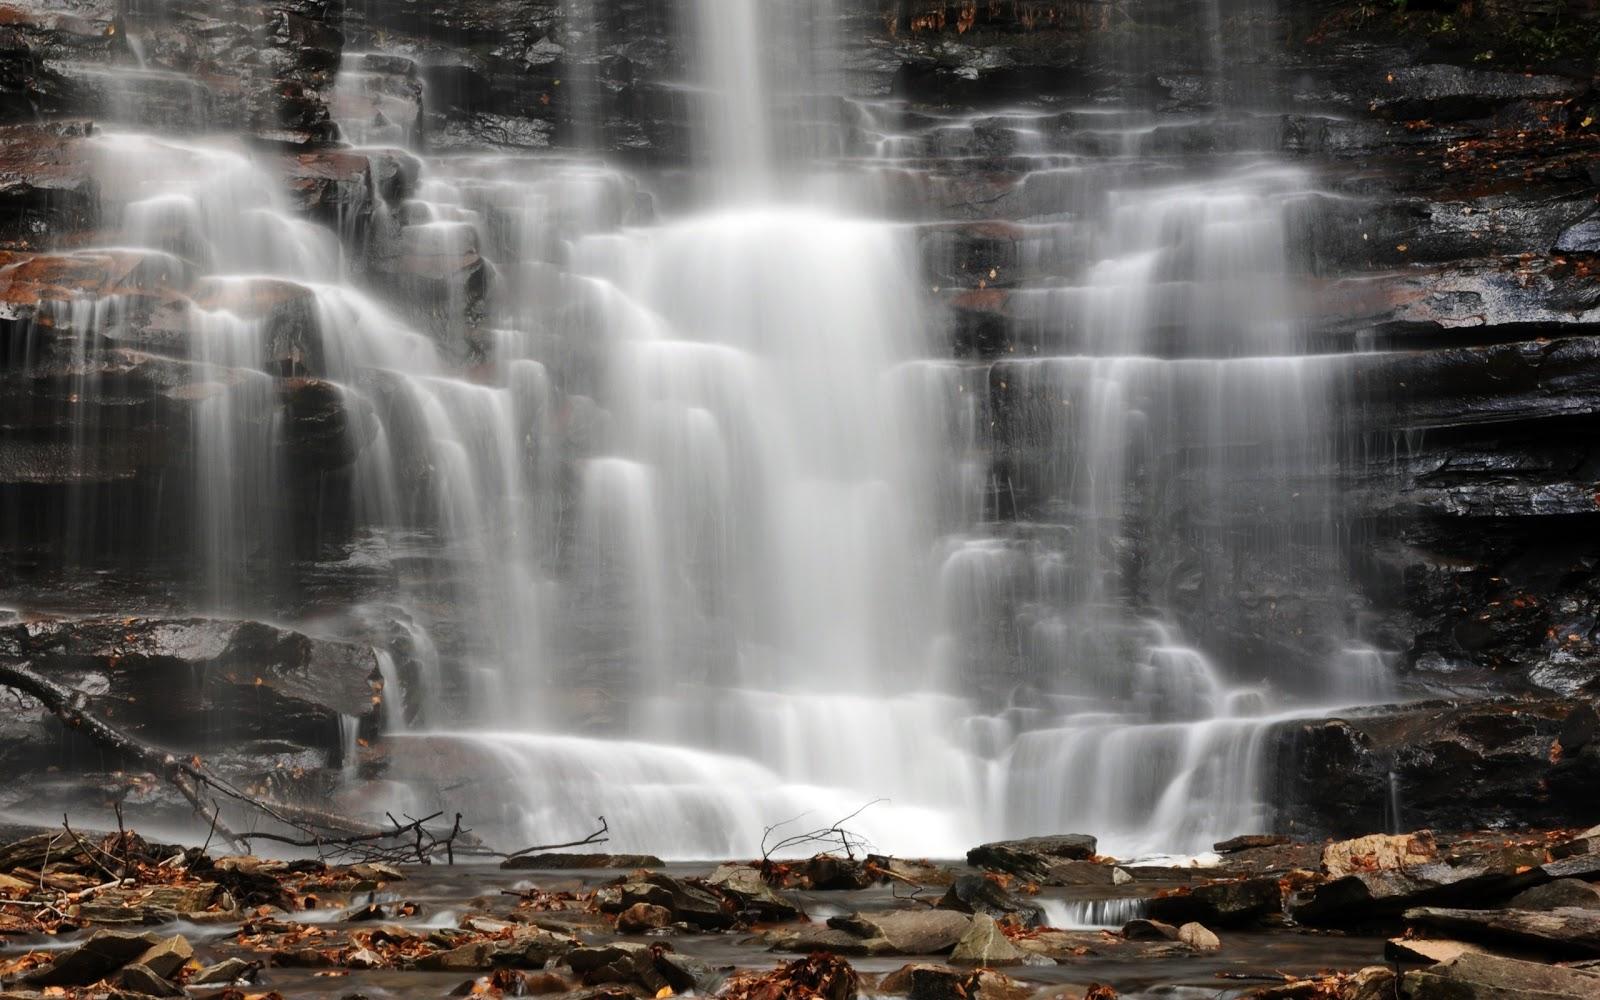 http://2.bp.blogspot.com/-JQB-Hiob_vk/T4_Myze81iI/AAAAAAAADV8/eFw4D4J8iMg/s1600/cascading-waterfall-windows-8-wallpaper-2560x1600.jpg